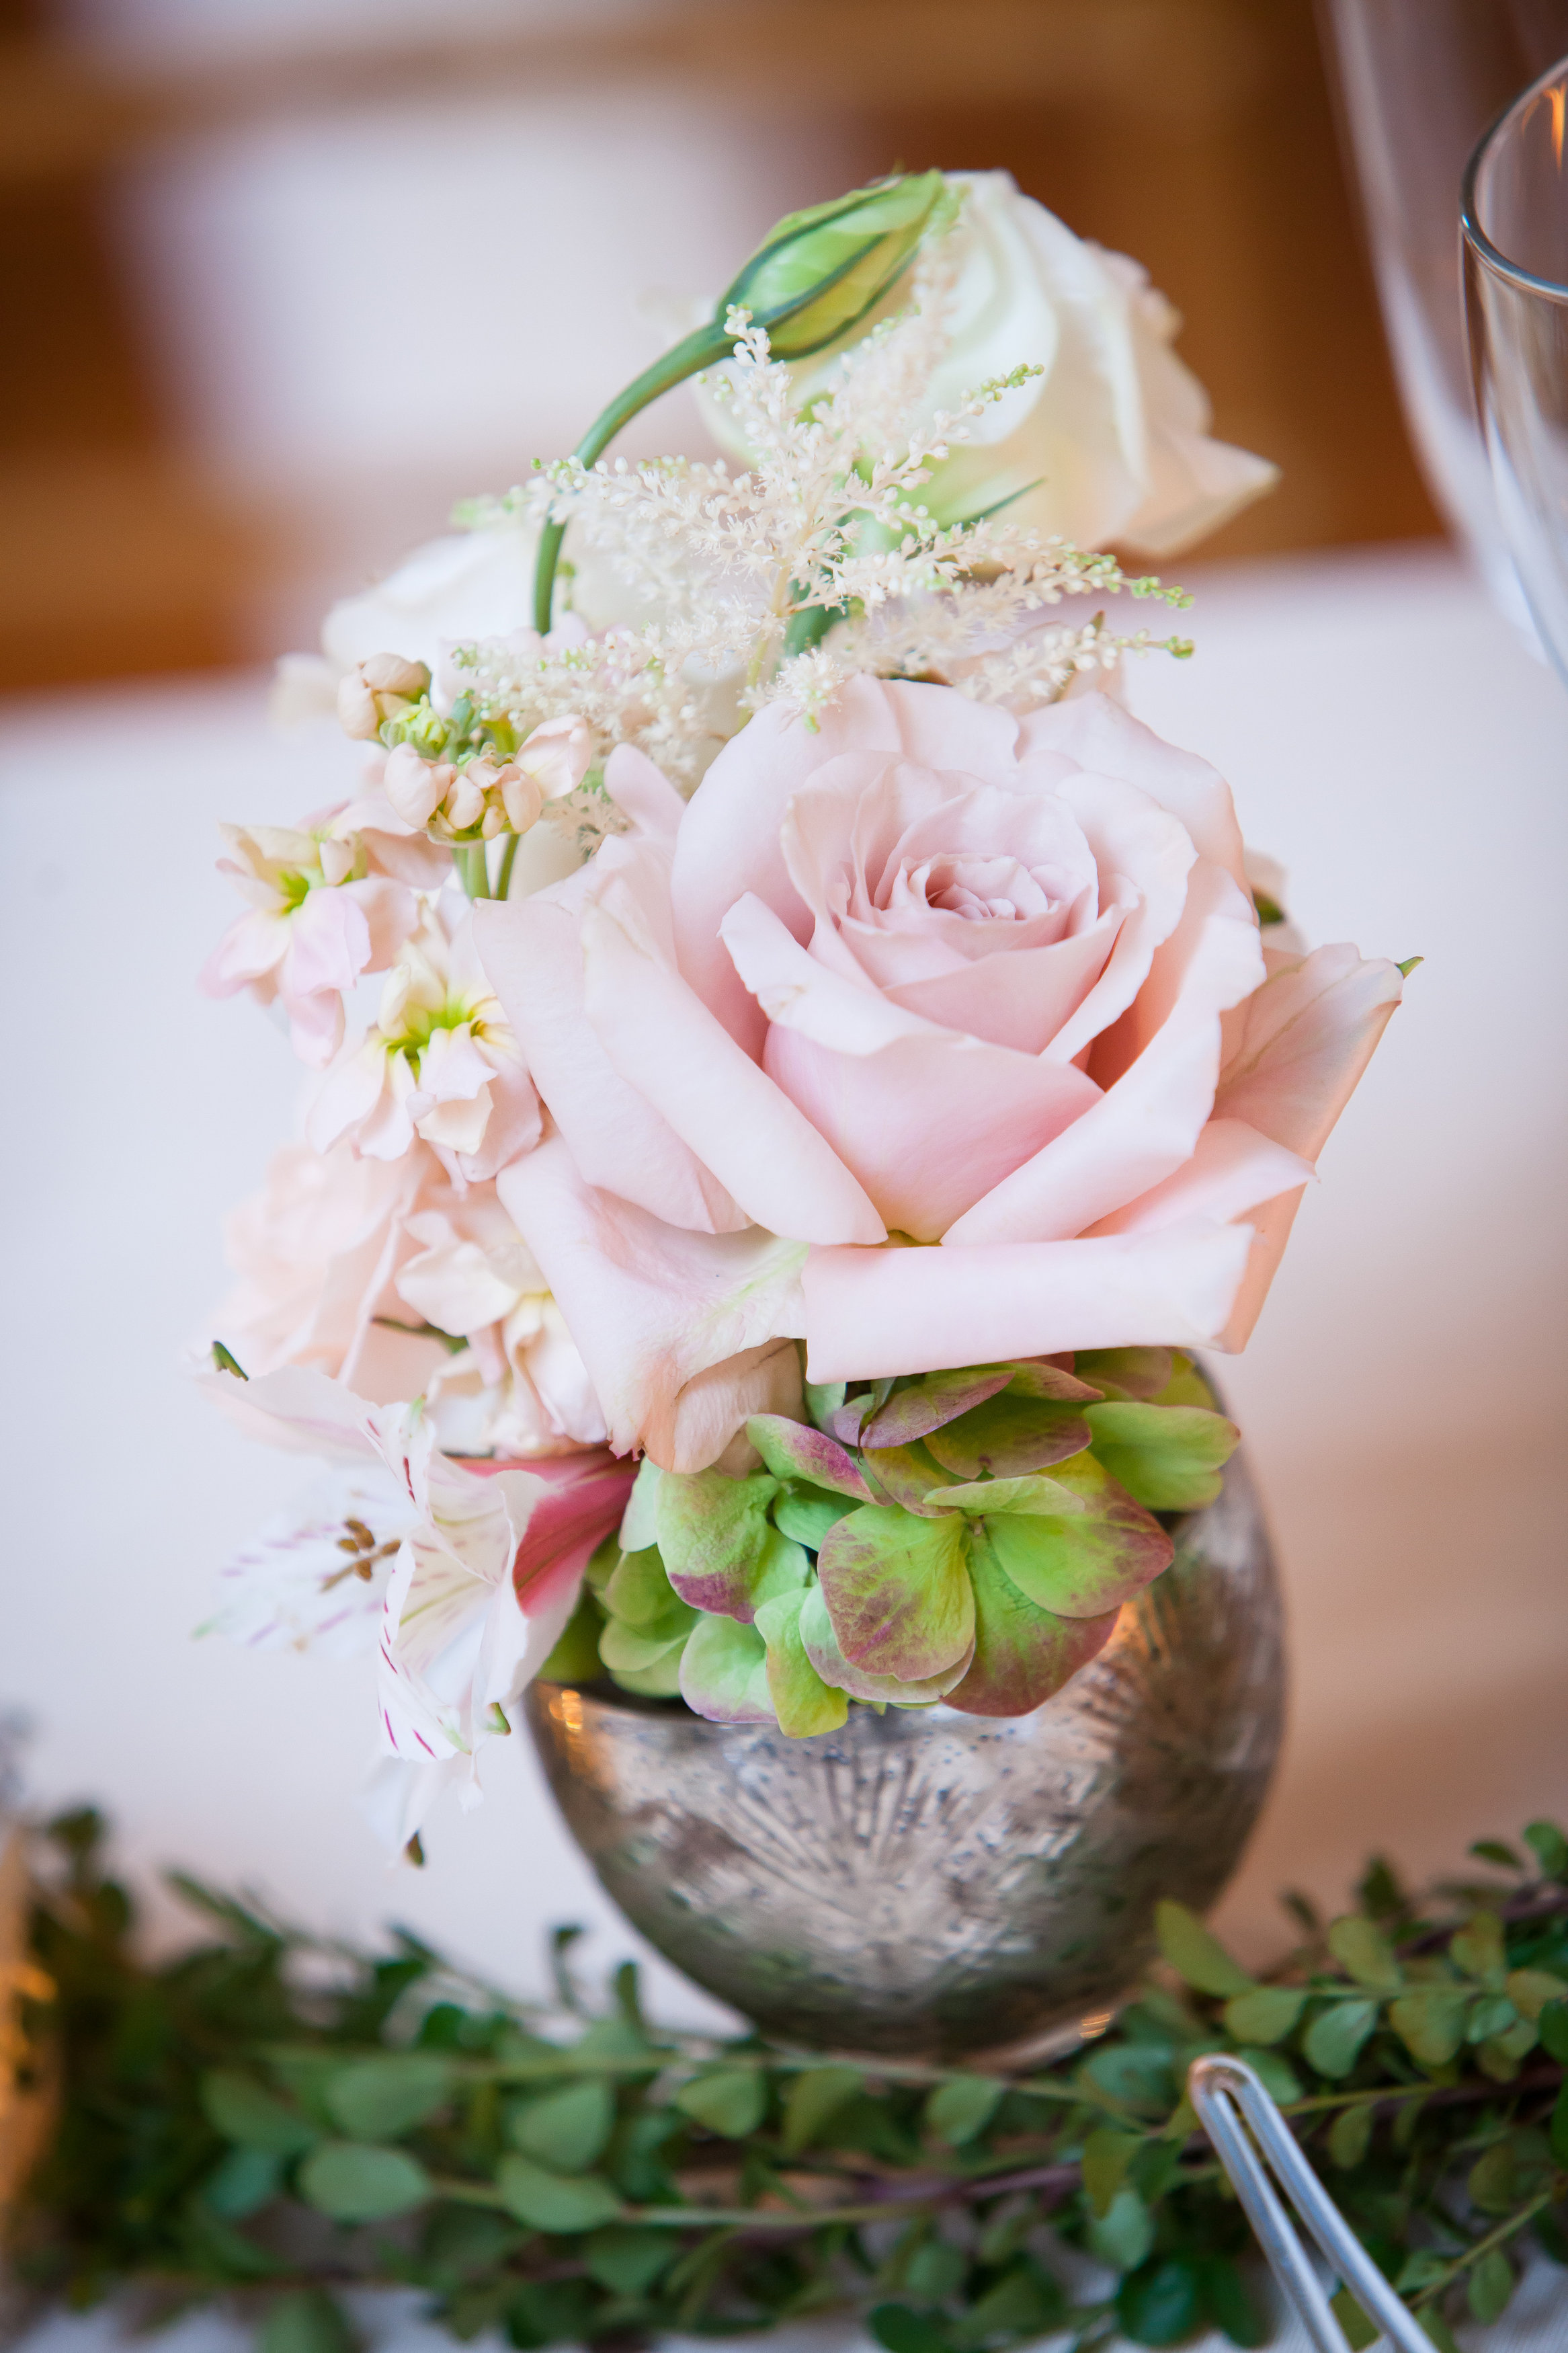 25 Philadelphia Wedding Florist Mercury Glass Pink Rose Reception Decor Aribella Events Historic Yellow Springs.jpg